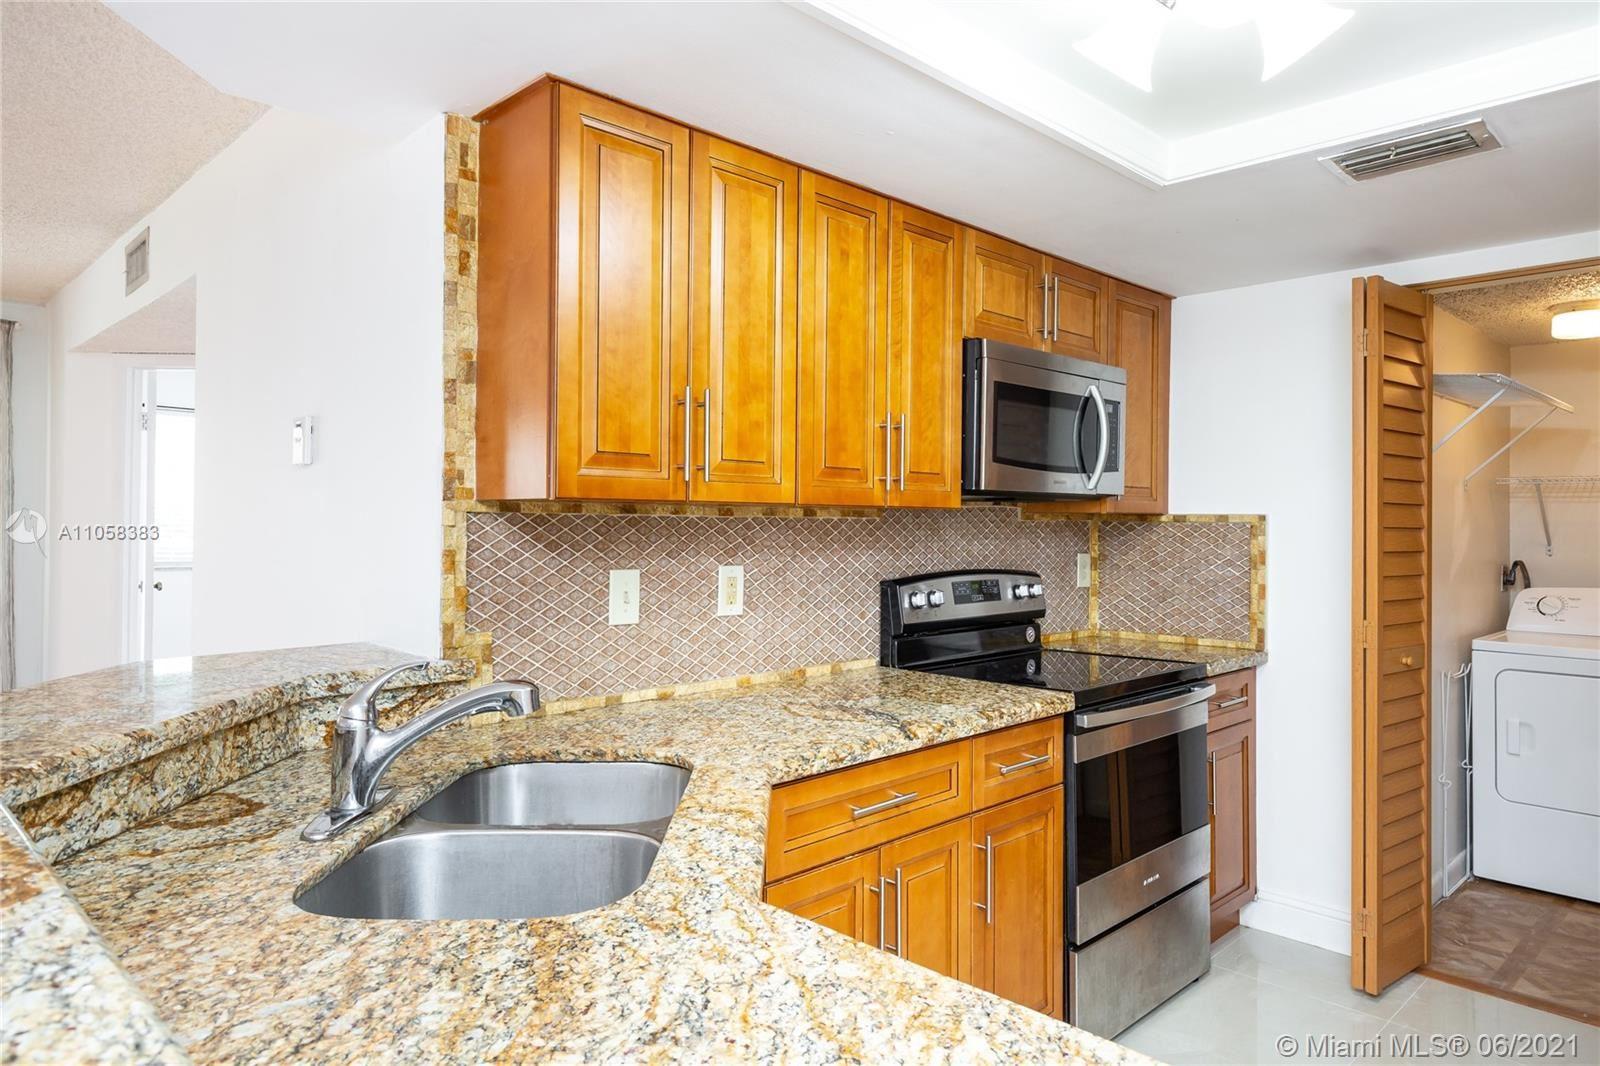 9044 W Atlantic Blvd #328, Coral Springs, FL 33071 - #: A11058383